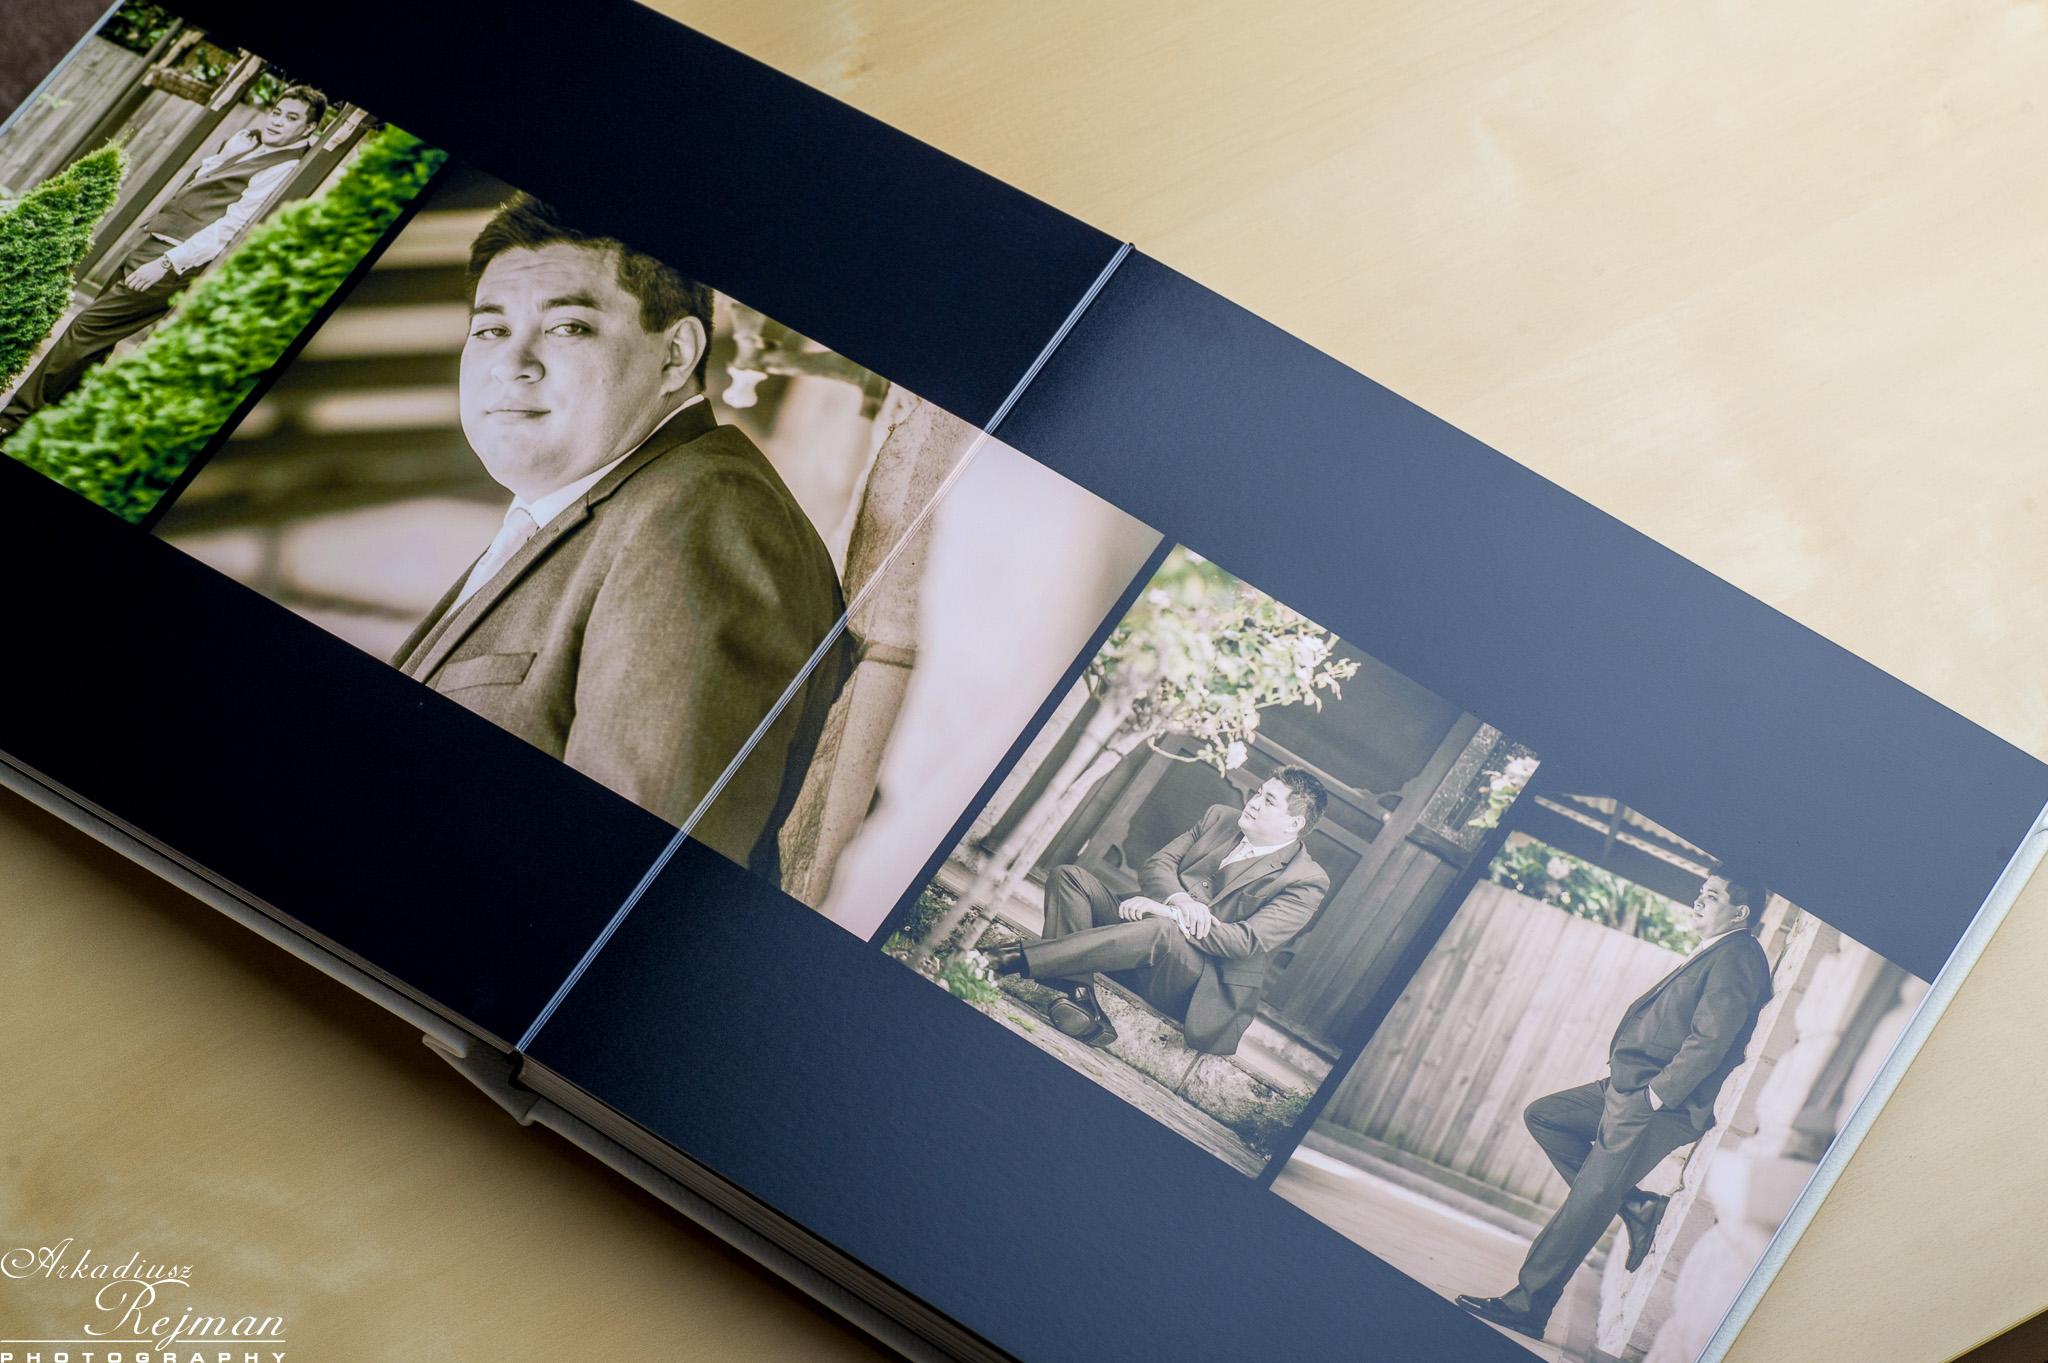 Album-FionaCameron-ProductPhoto-002.jpg